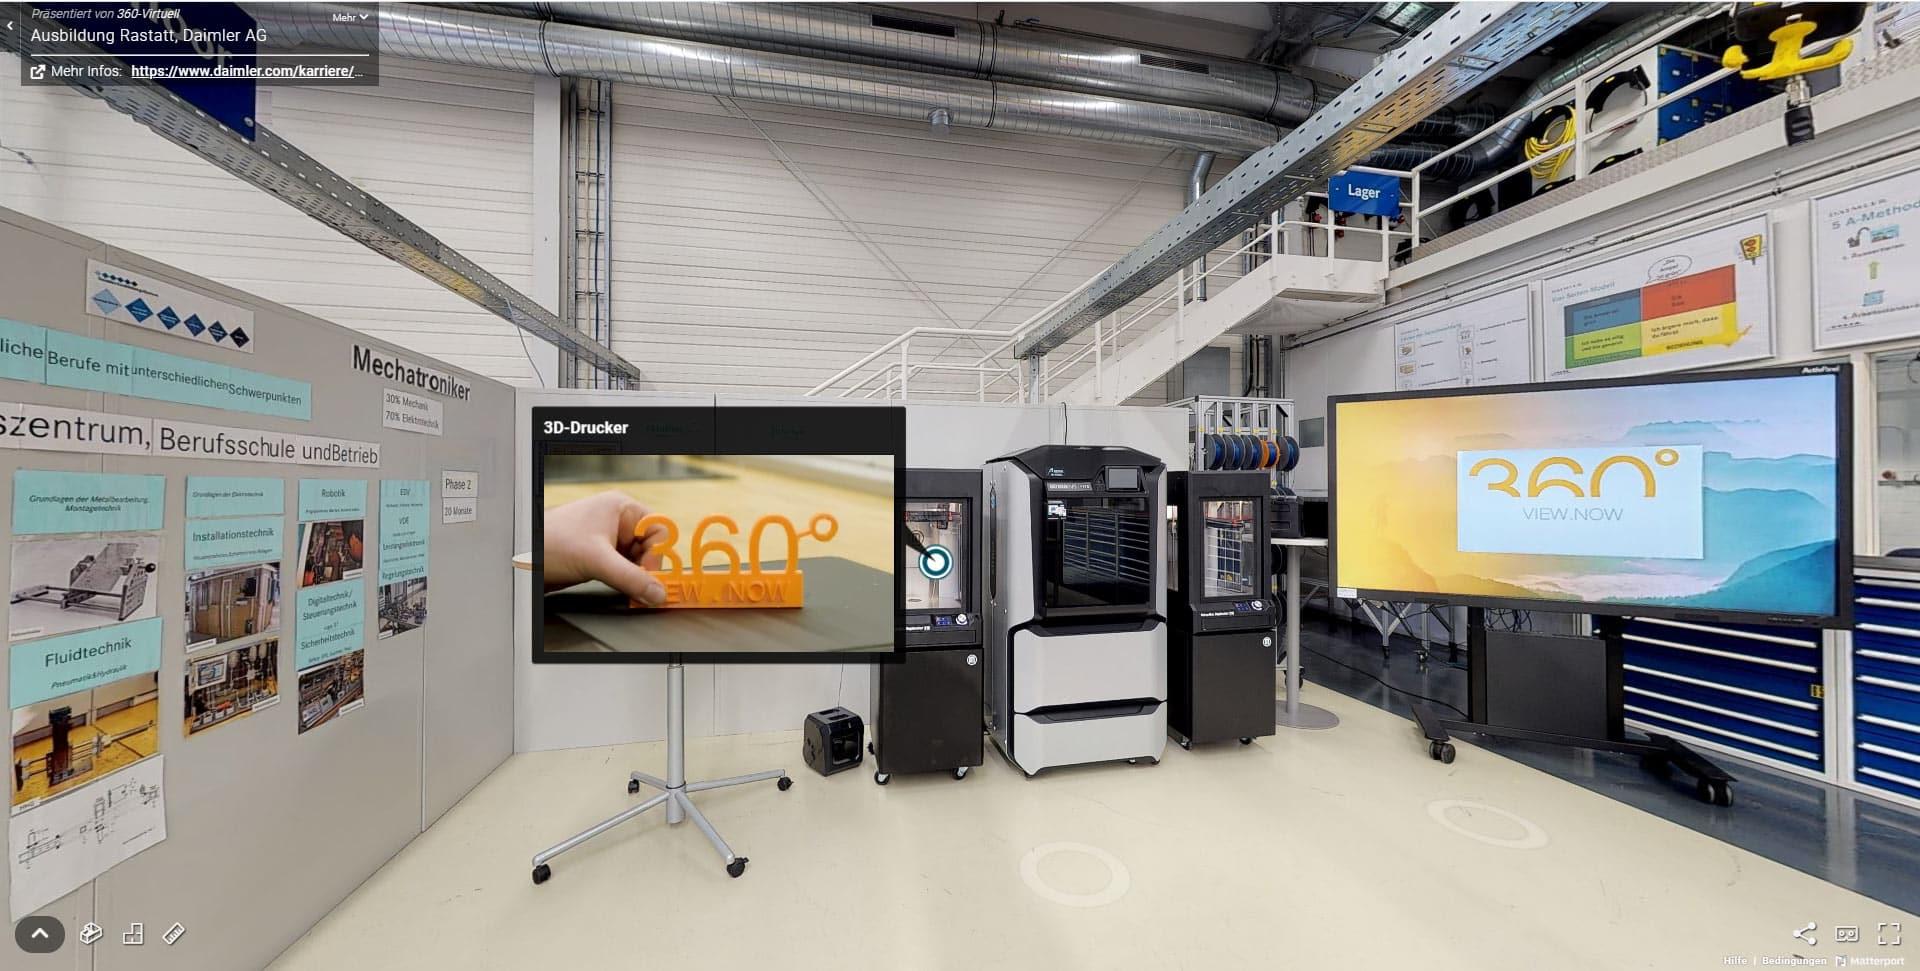 Ausbildungsstätte Daimler in 360 view